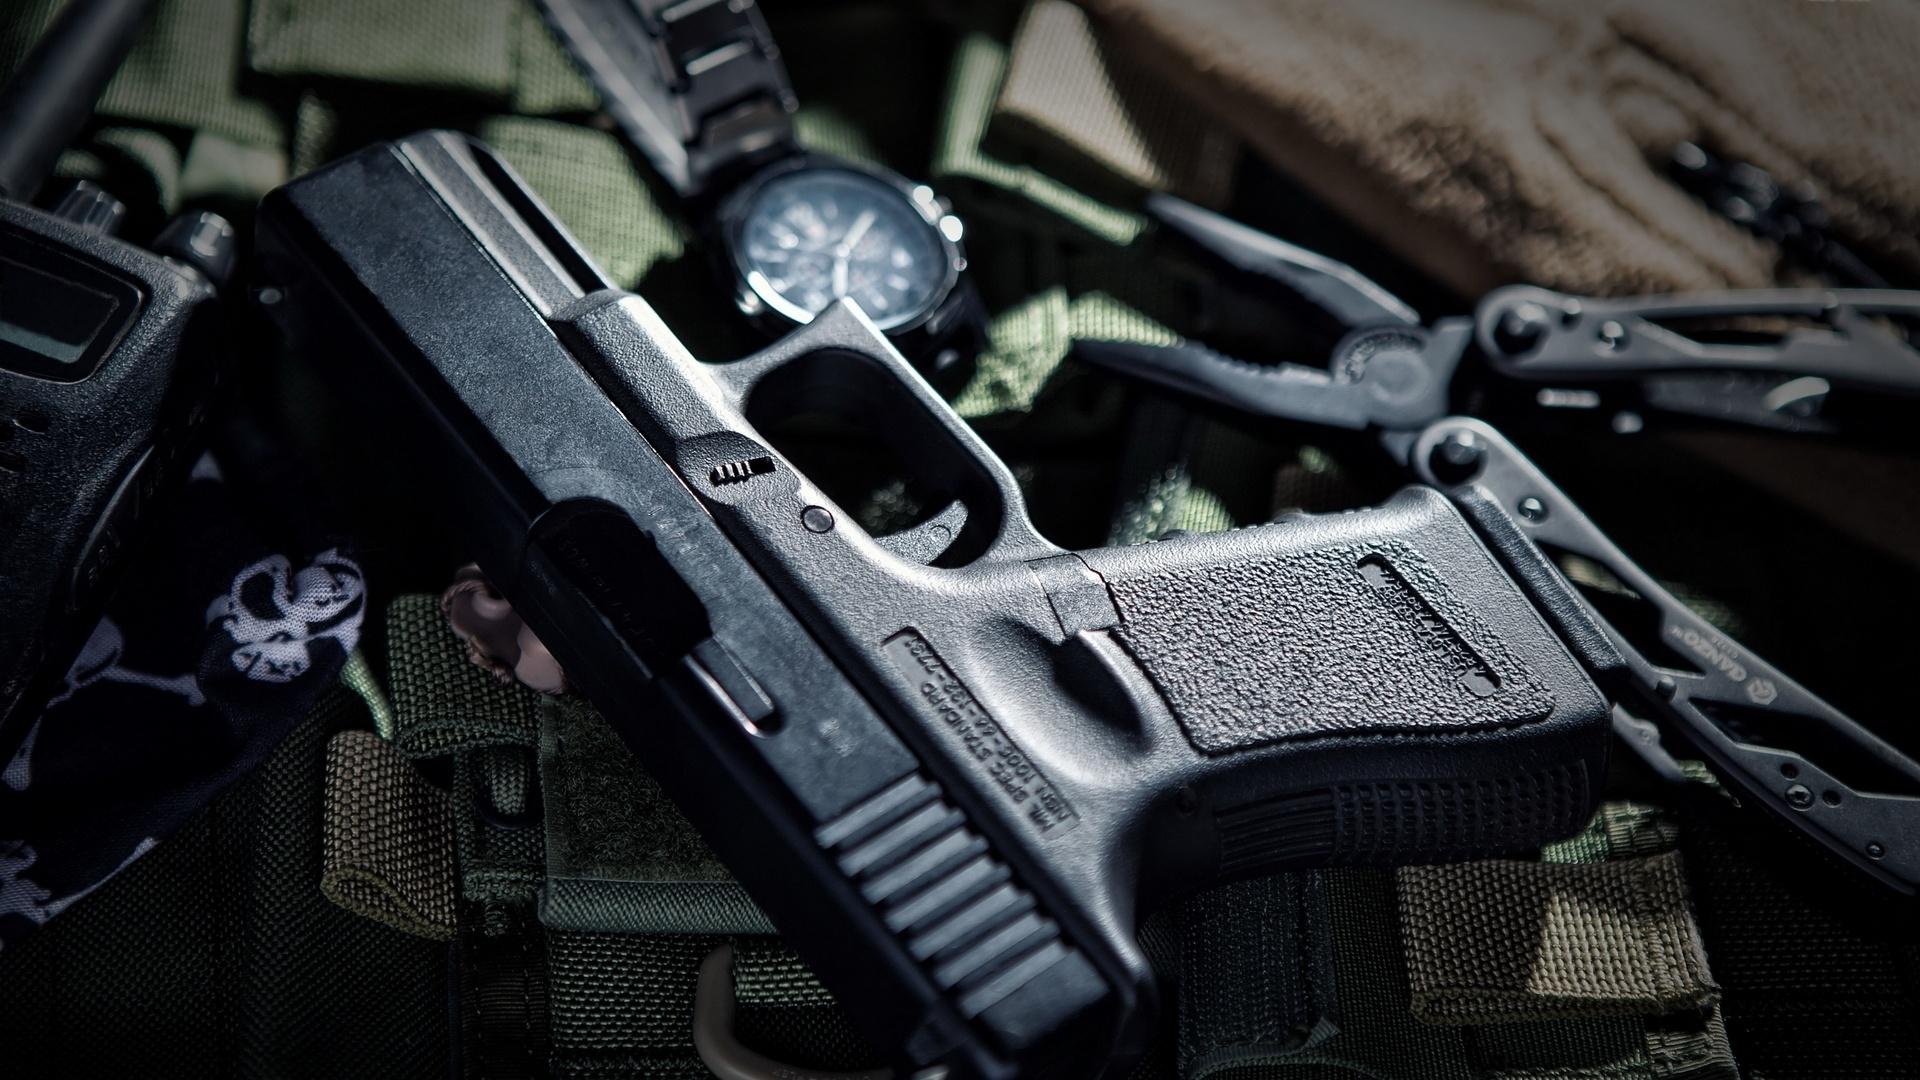 Glock Pistol Wallpaper HD 60128 1920x1080 px ...